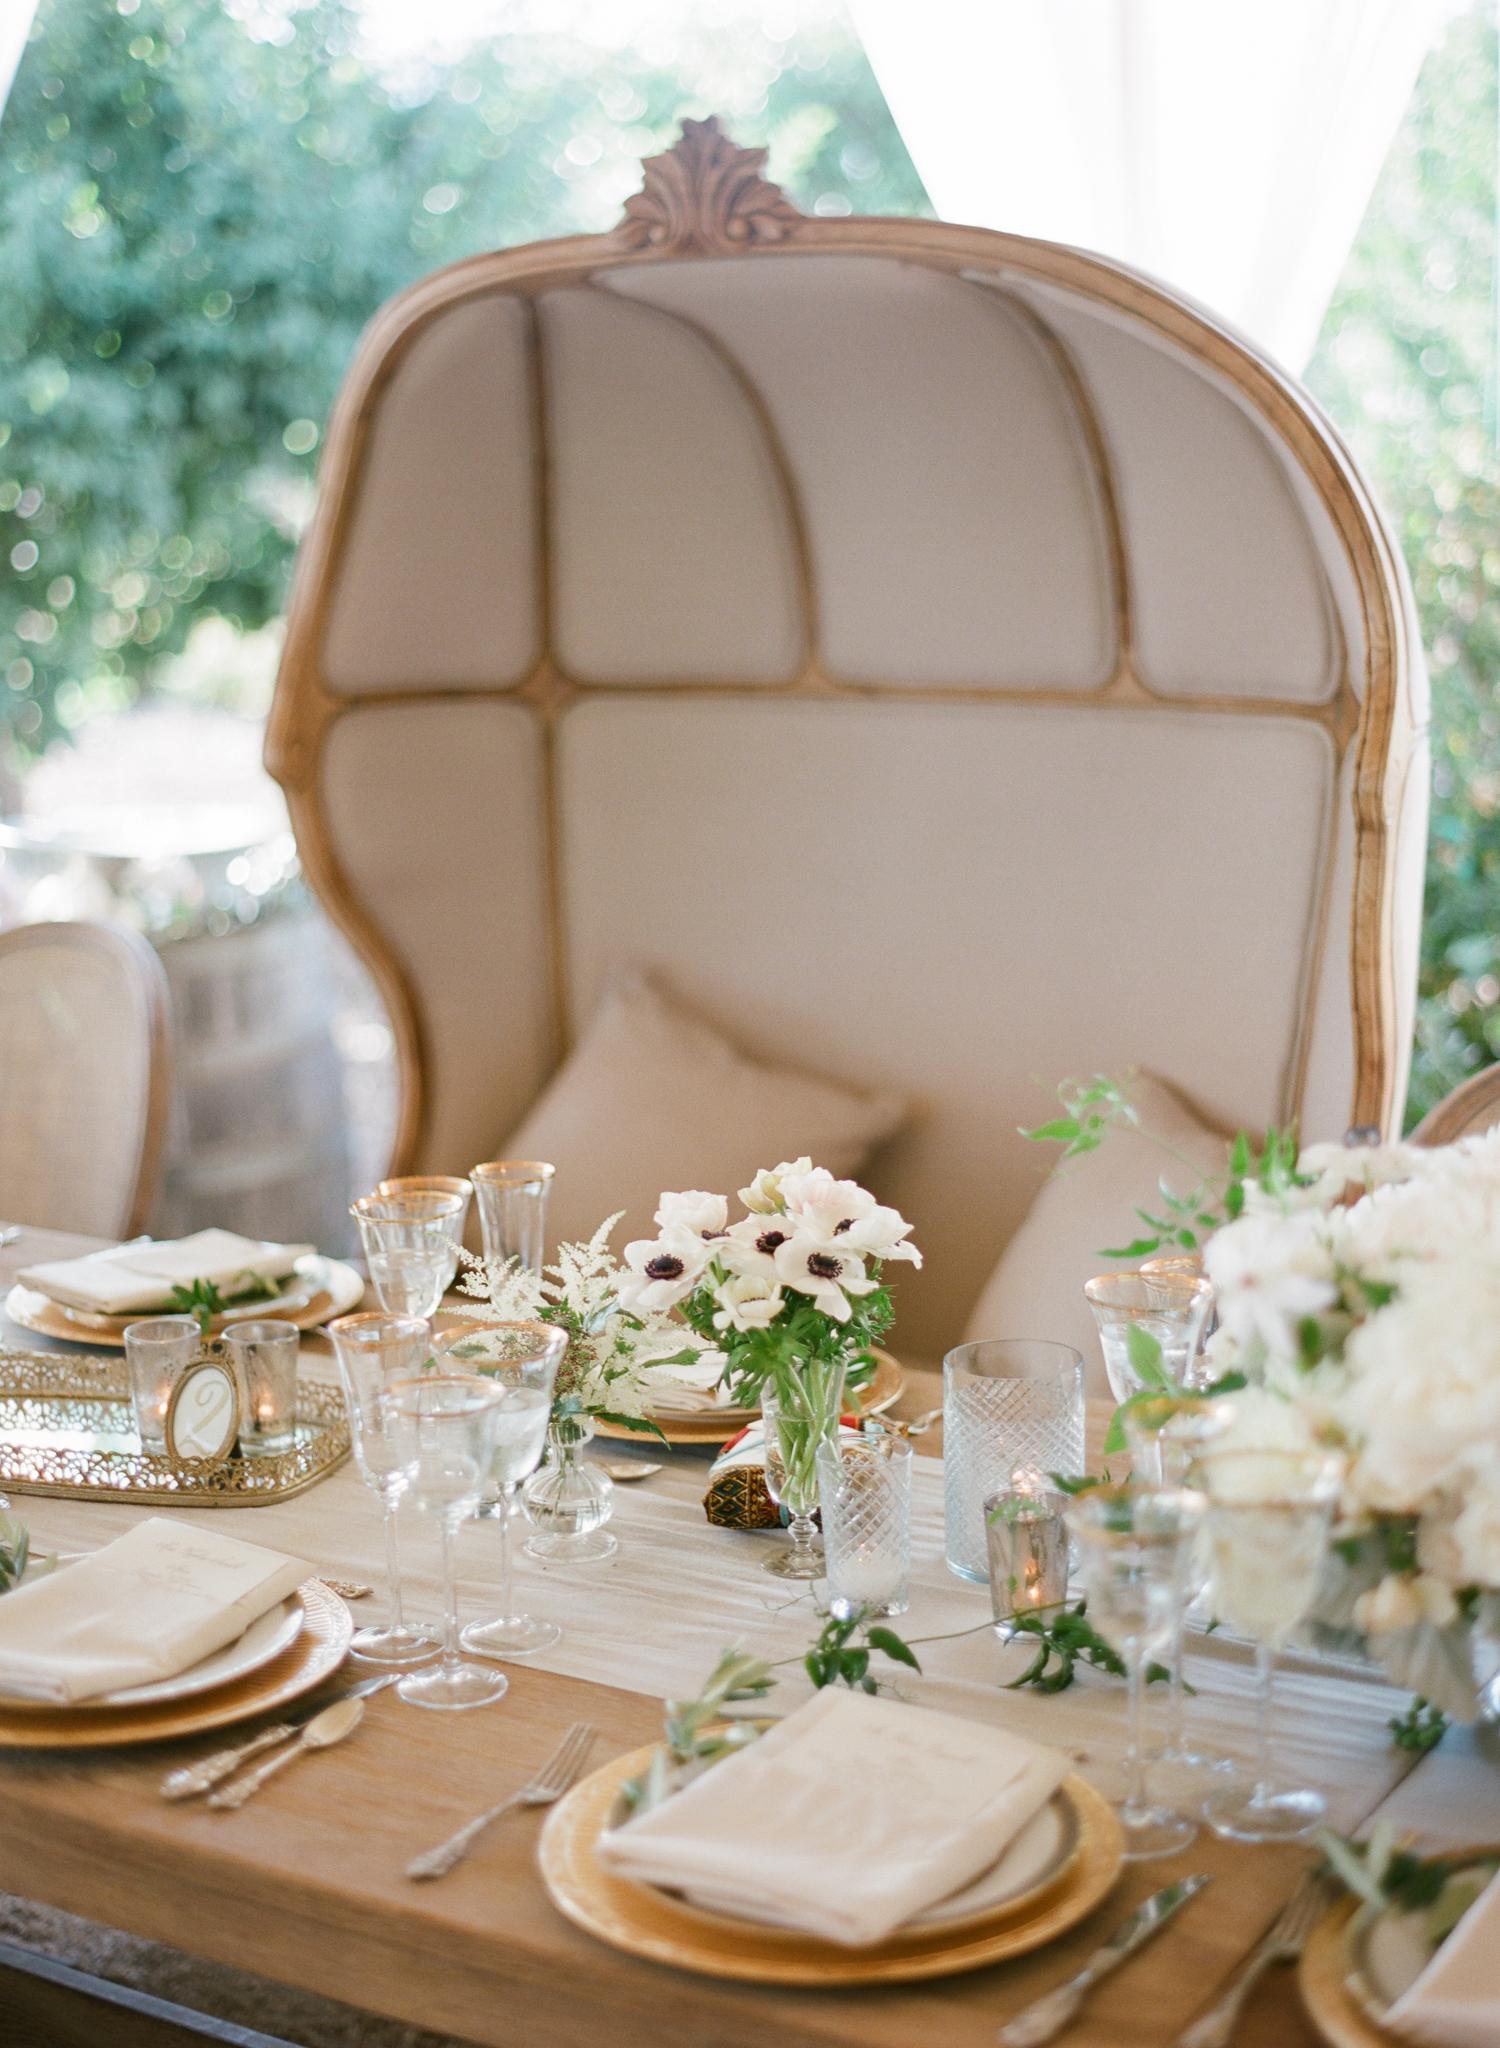 15 Private Estate Wedding Event Design by Joy Proctor.JPG